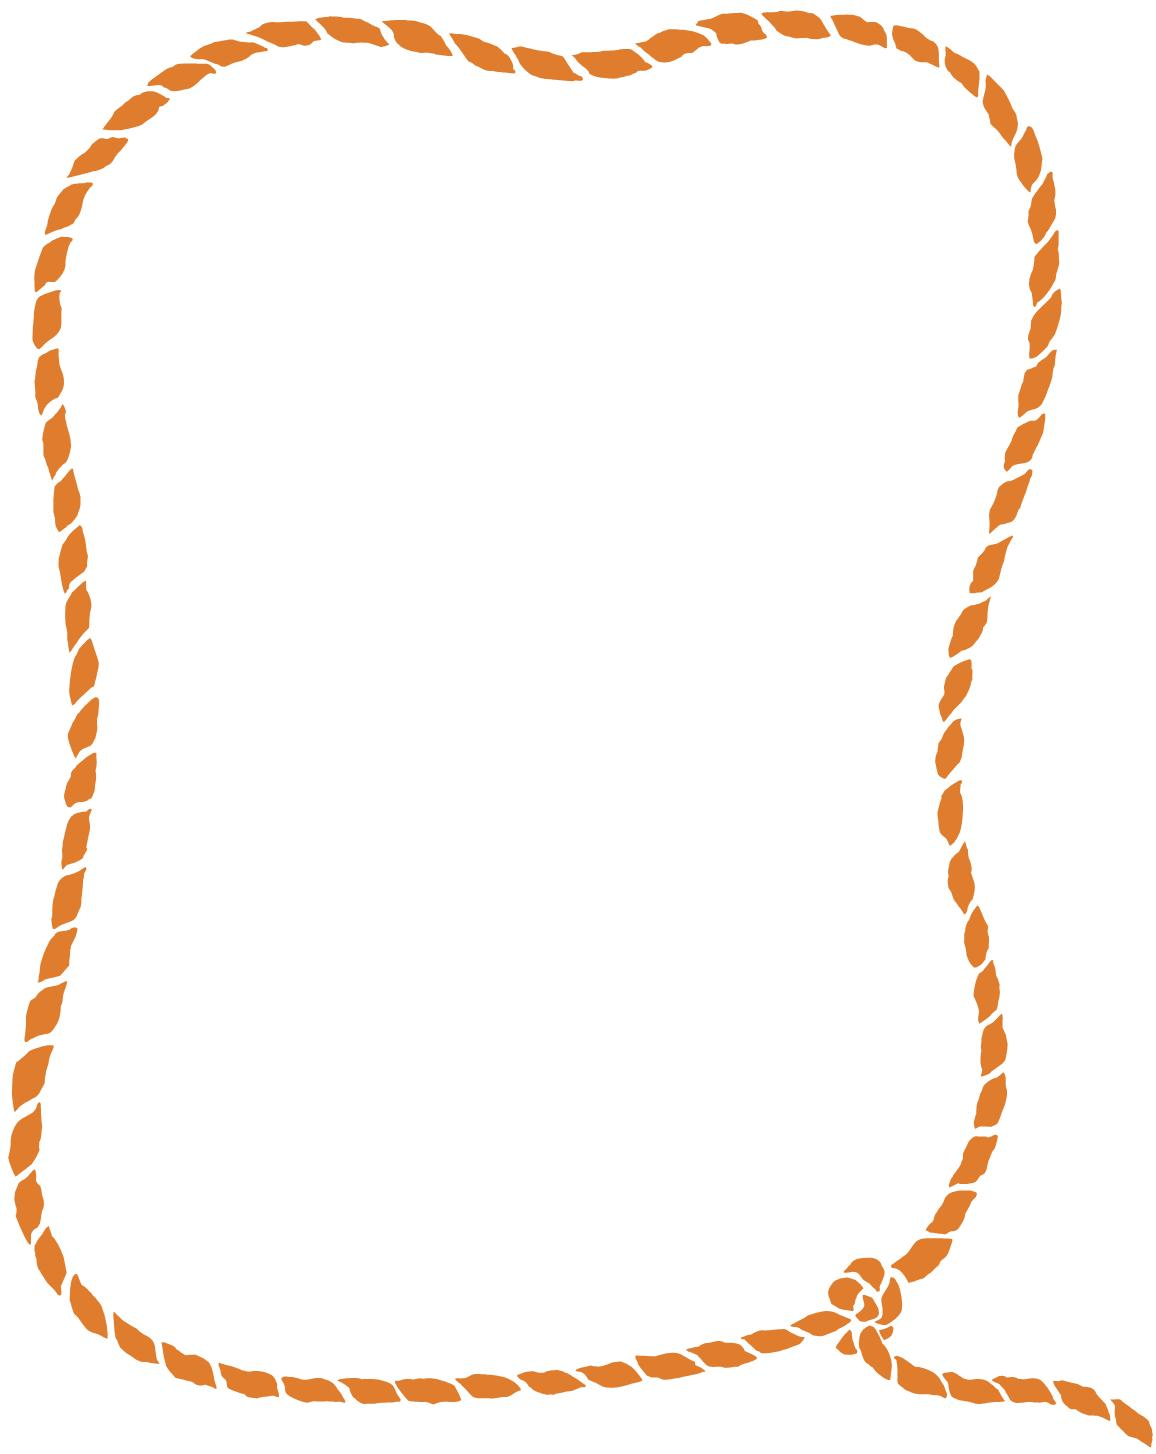 Rope Border Clip Art